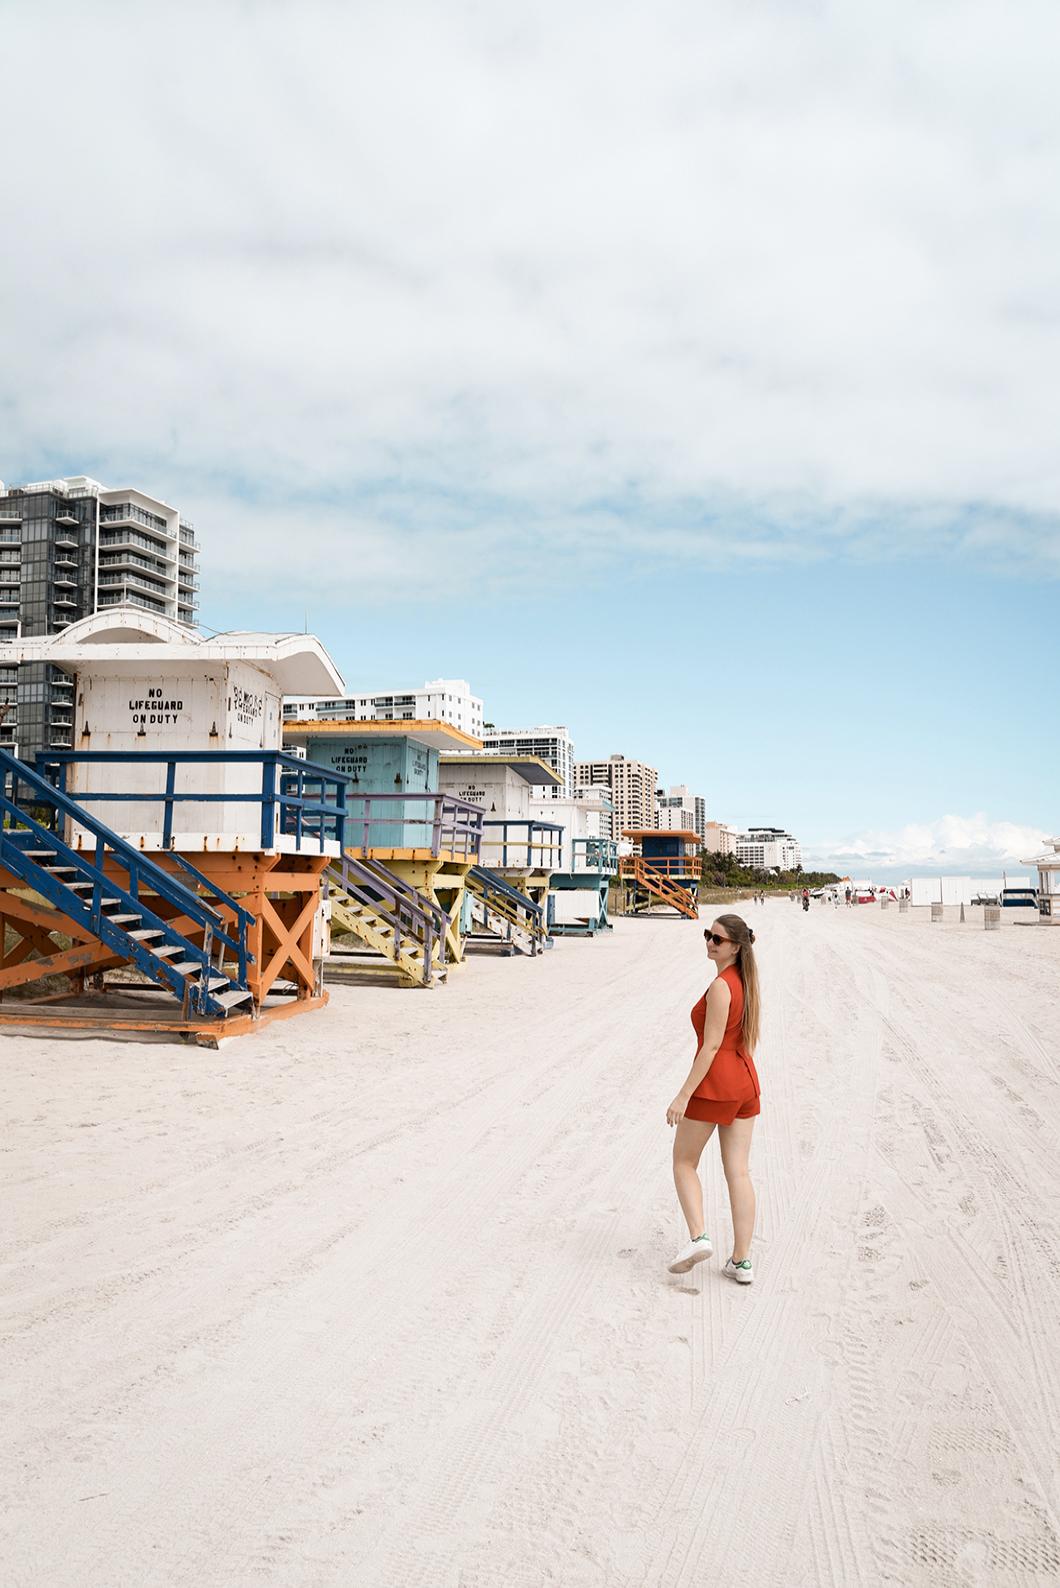 Plage de South Beach